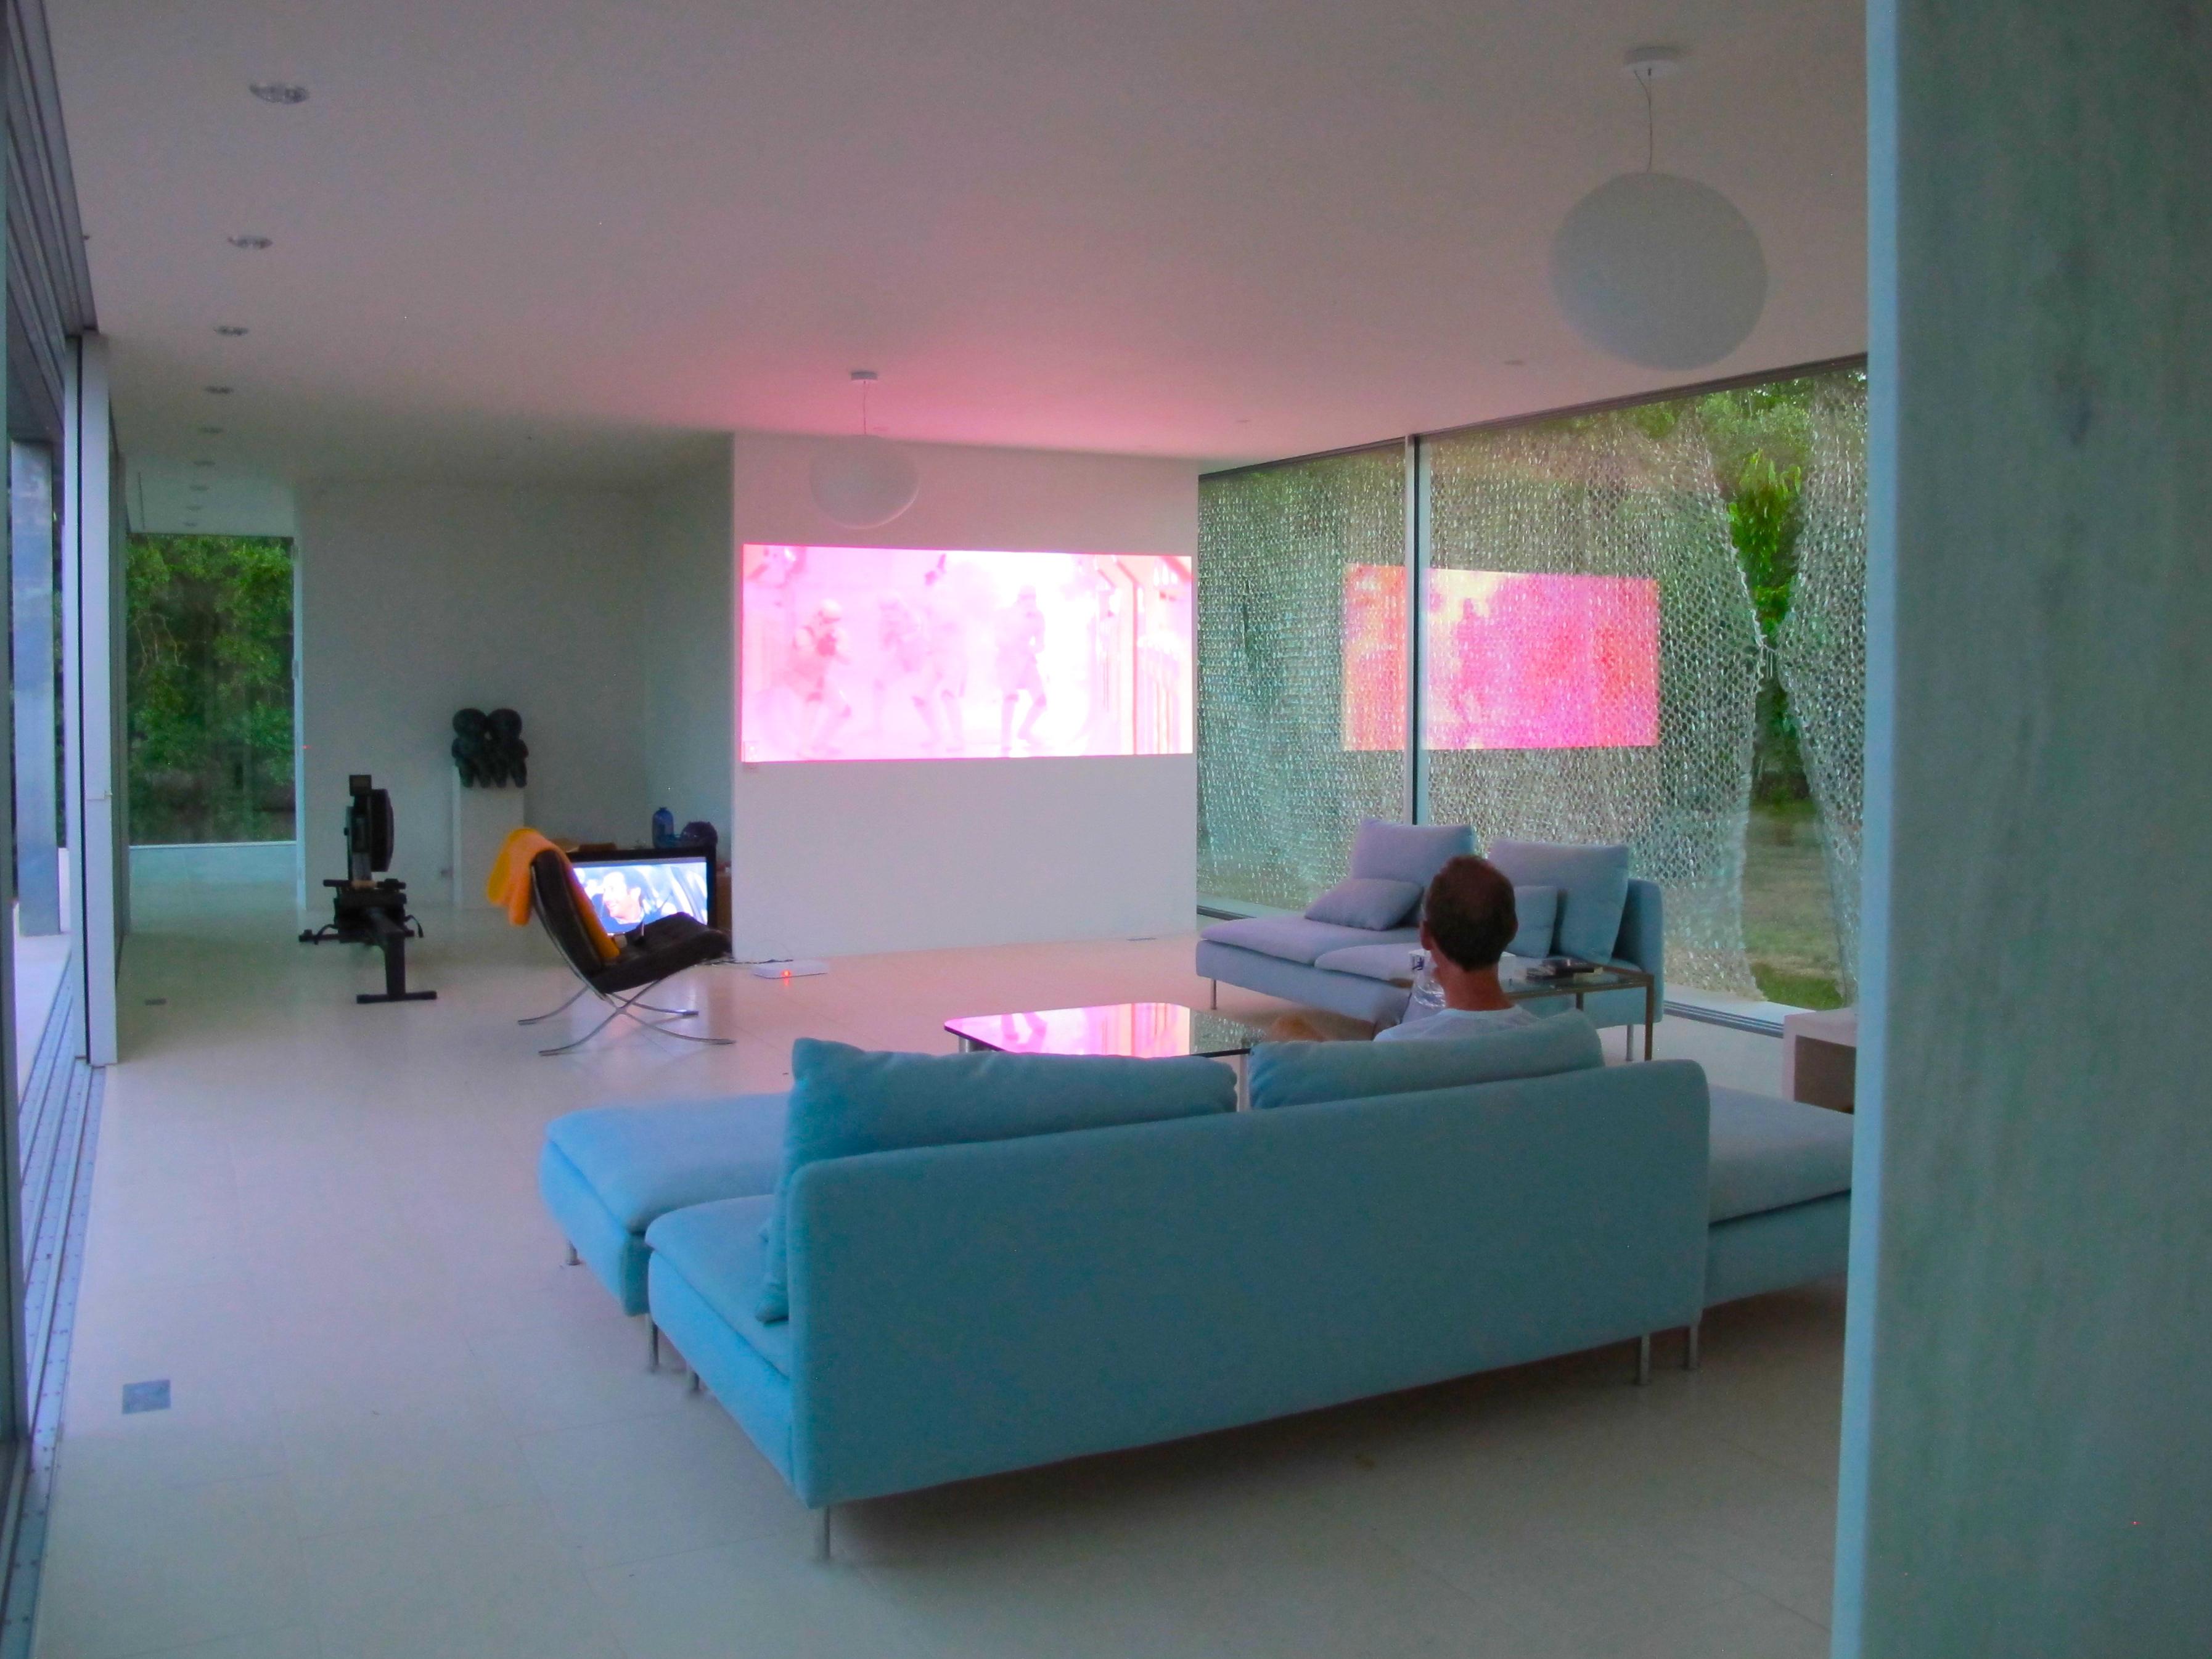 muyldermans house, multimedia